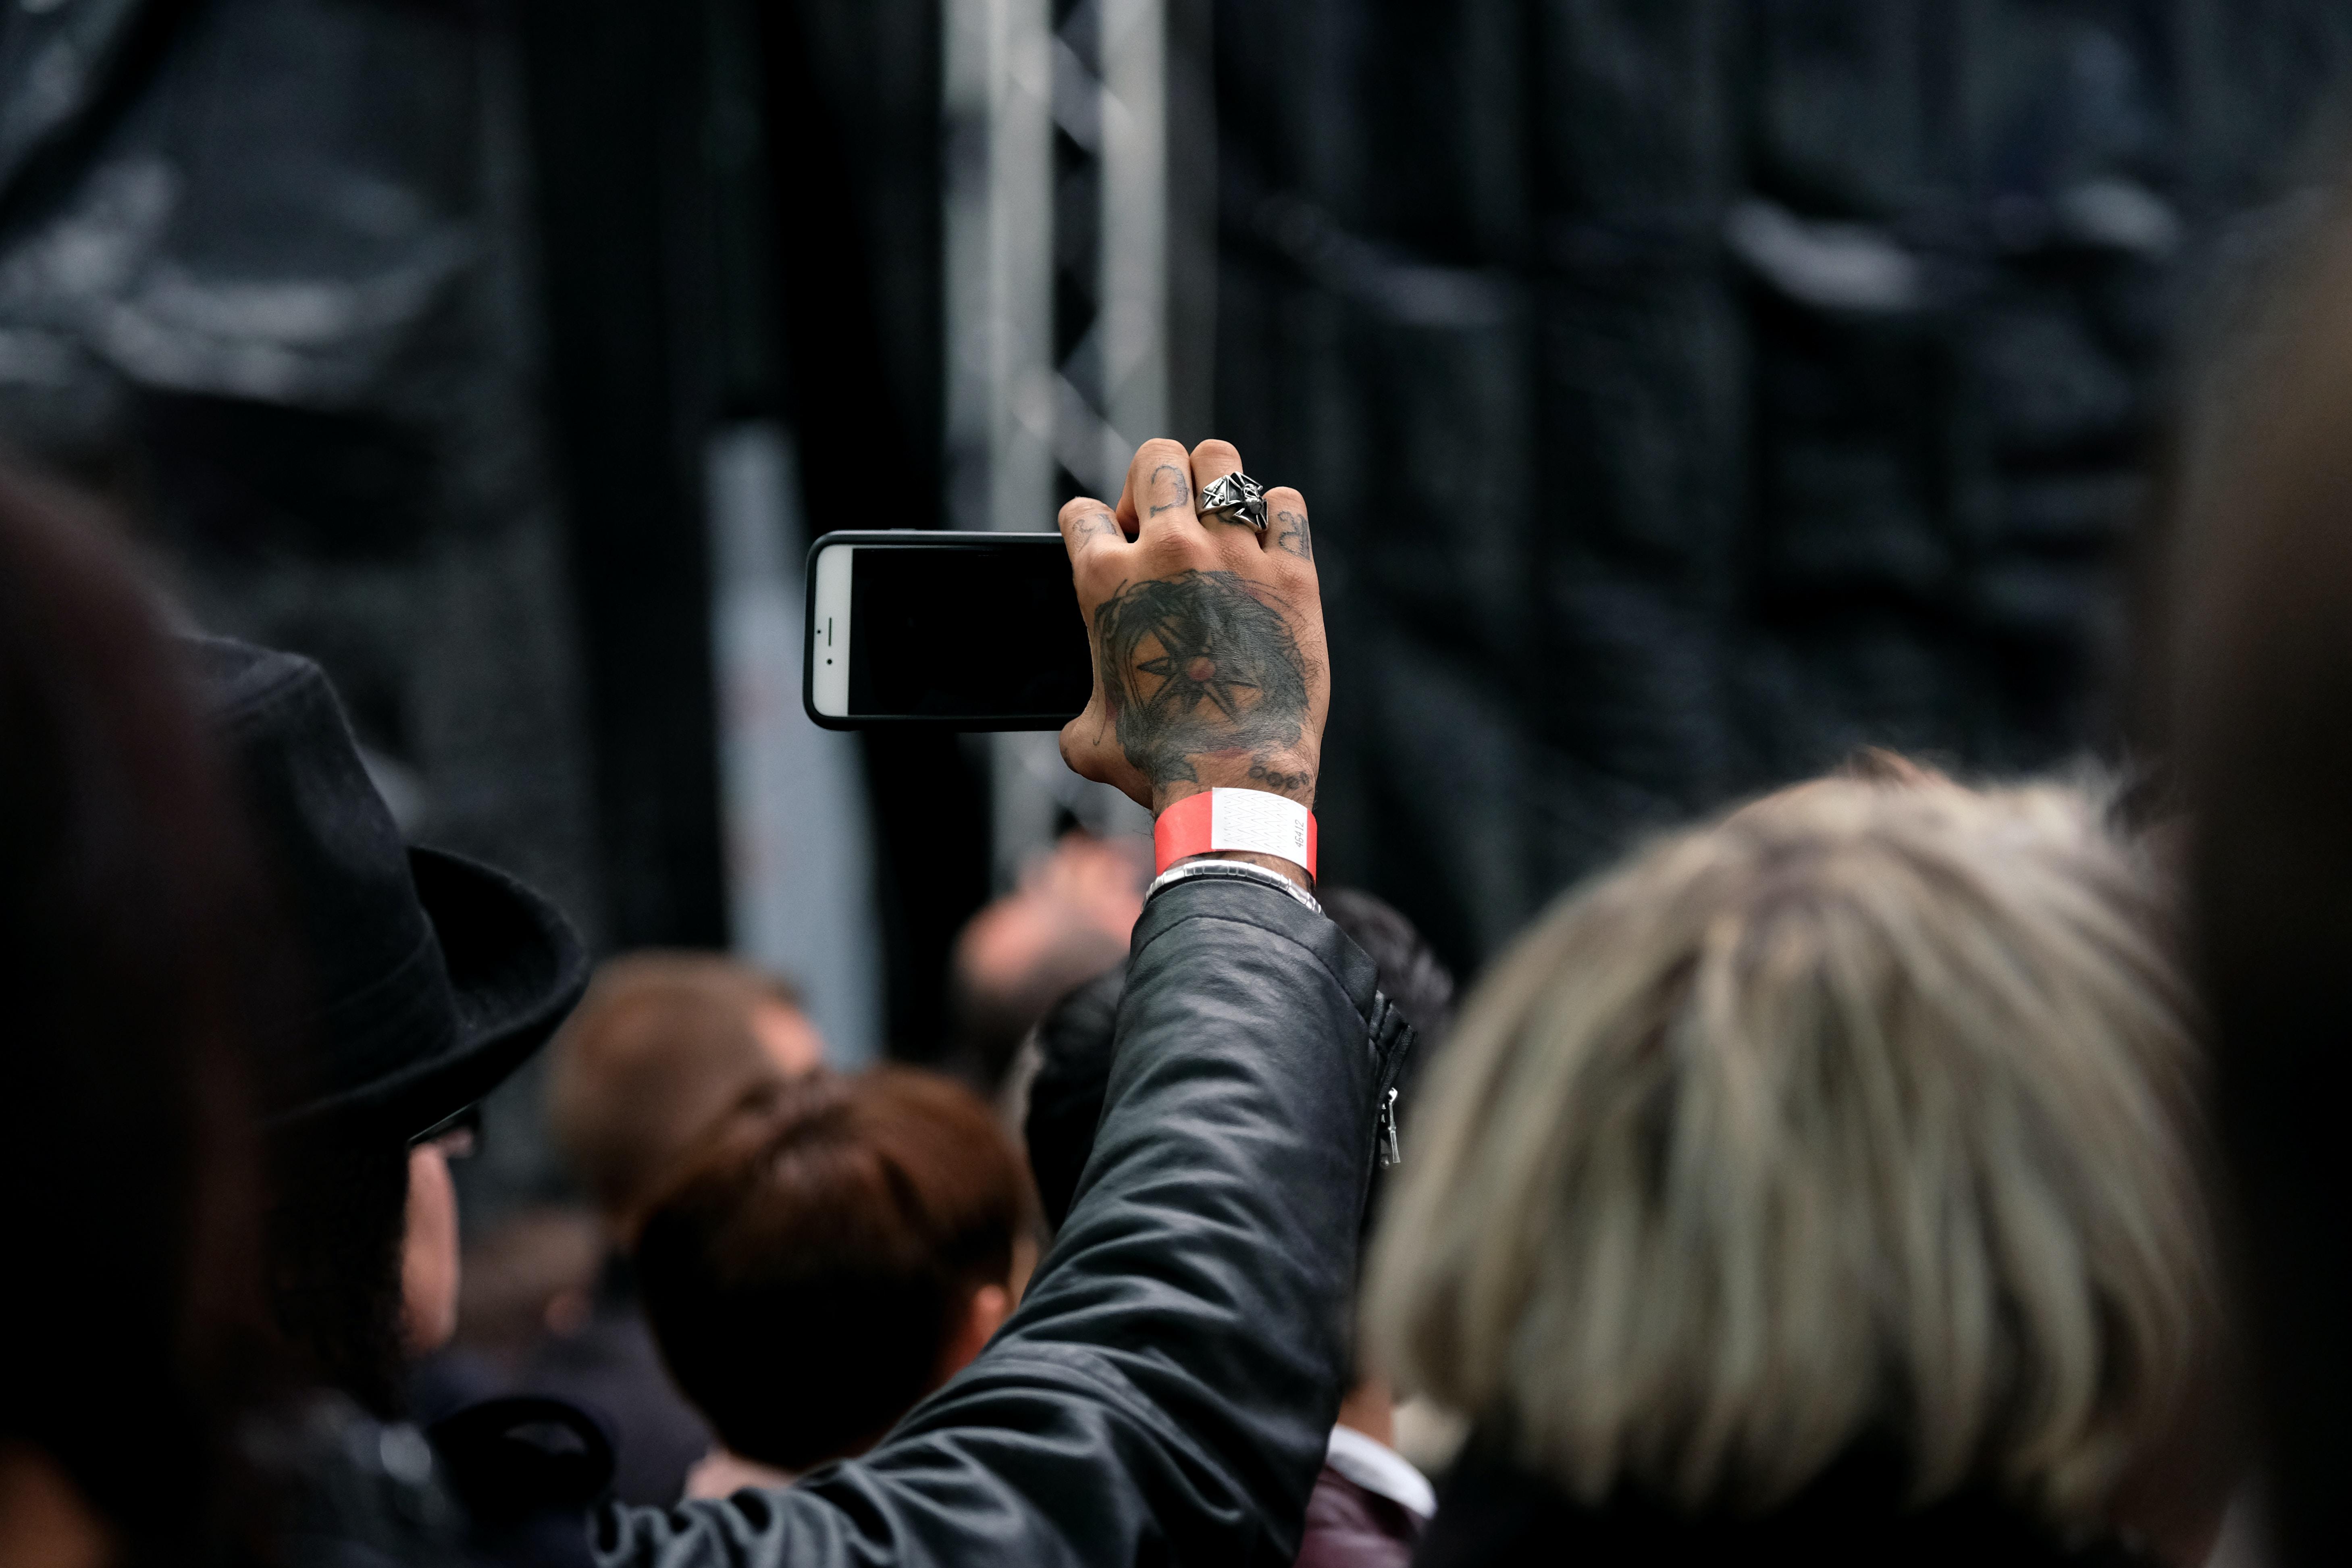 person wearing black jacket using white phone